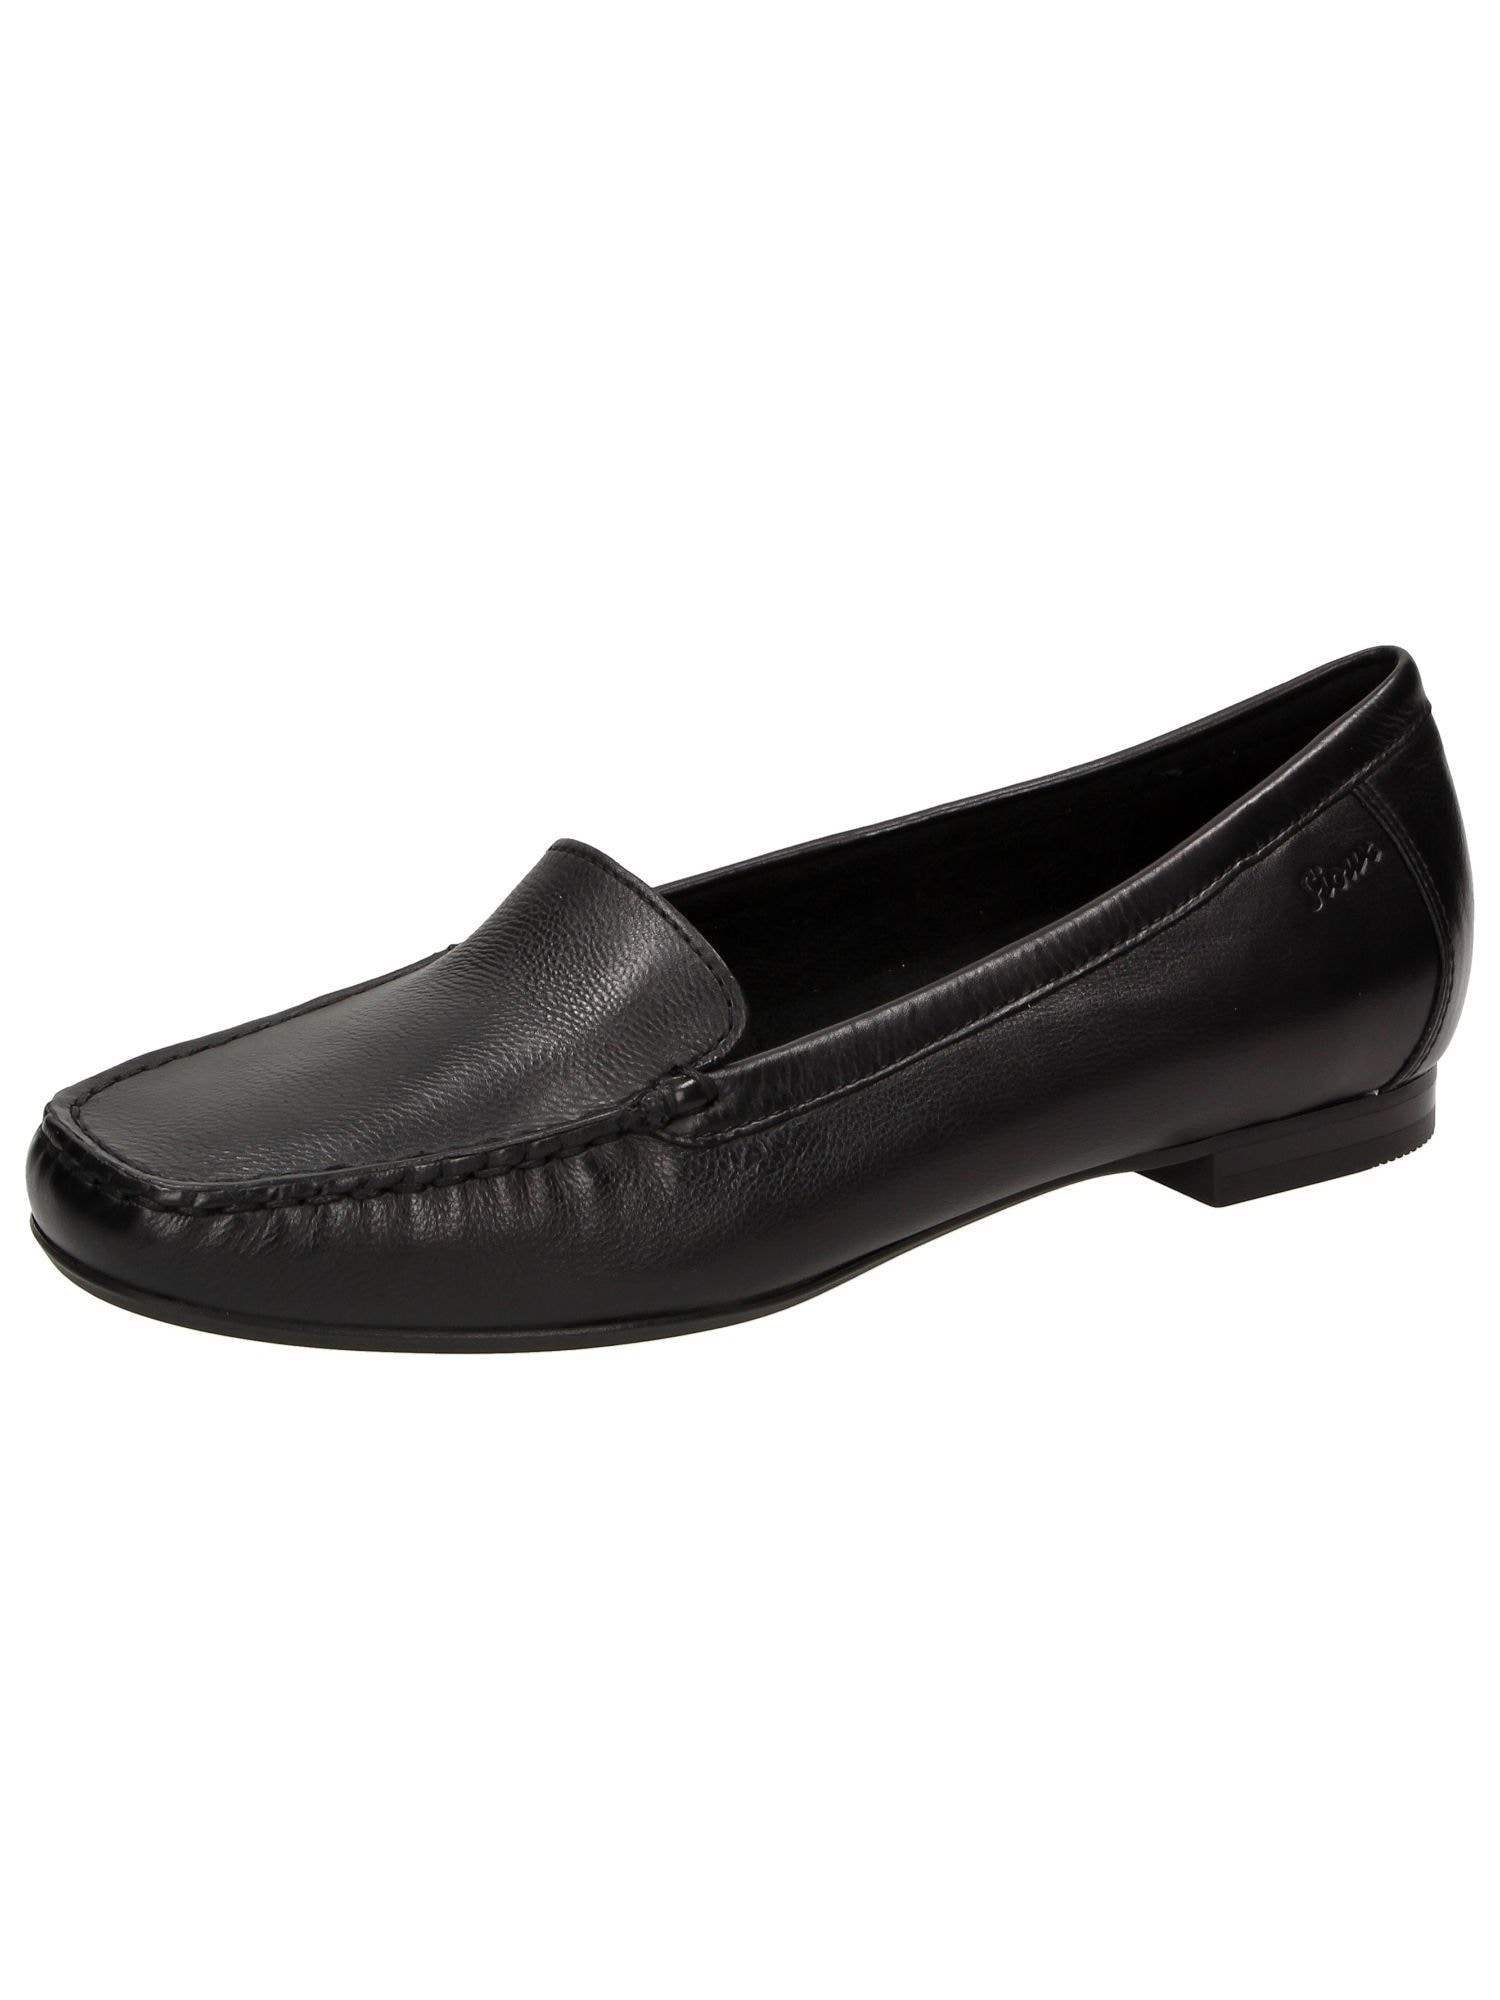 Mokassin 'Zalla' | Schuhe > Mokassins | Schwarz | SIOUX